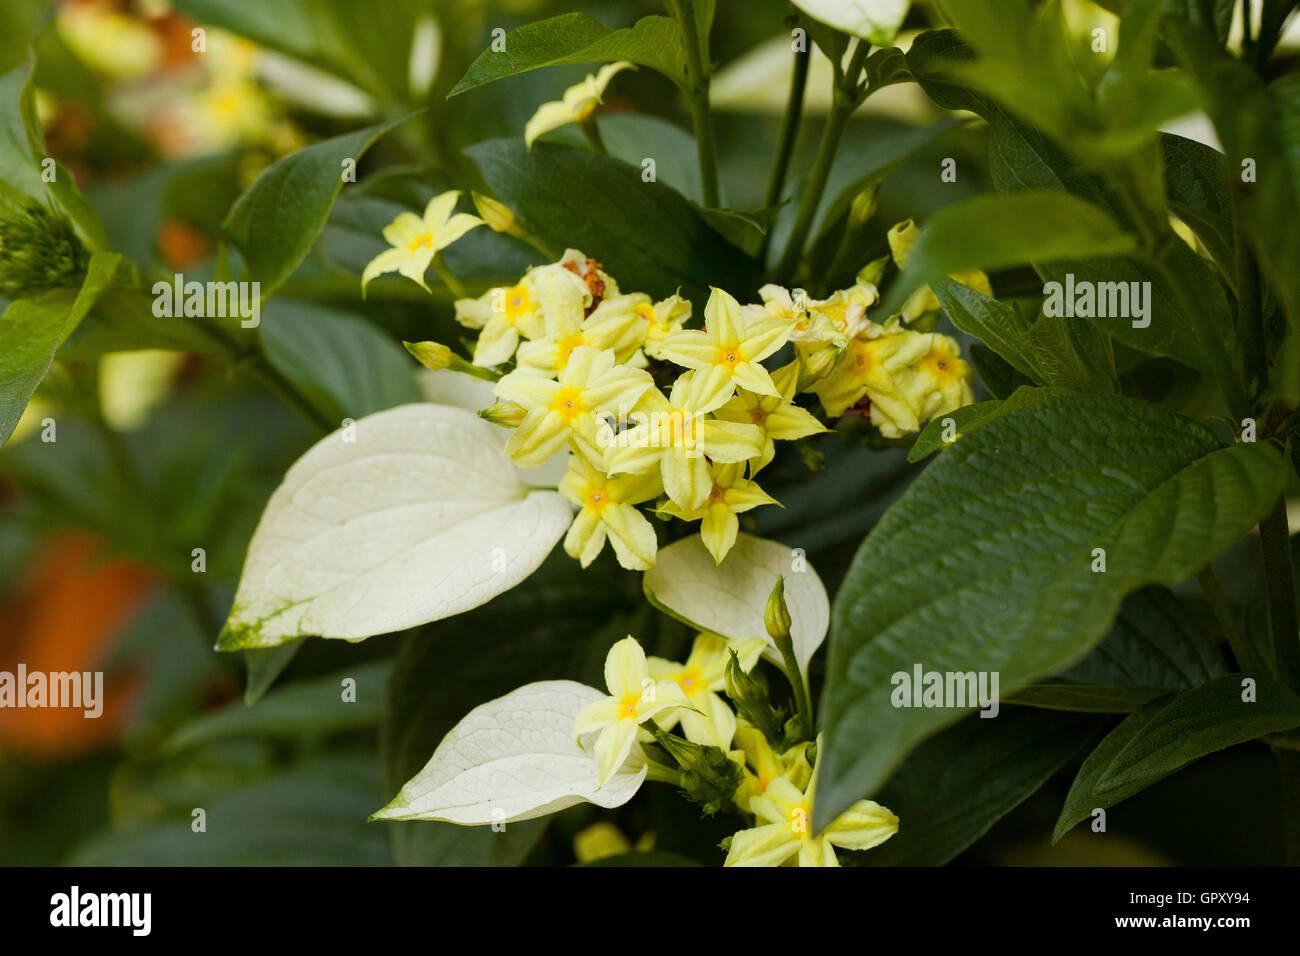 Dwarf Mussaenda plant flowers (Mussaenda glabra) - USA - Stock Image